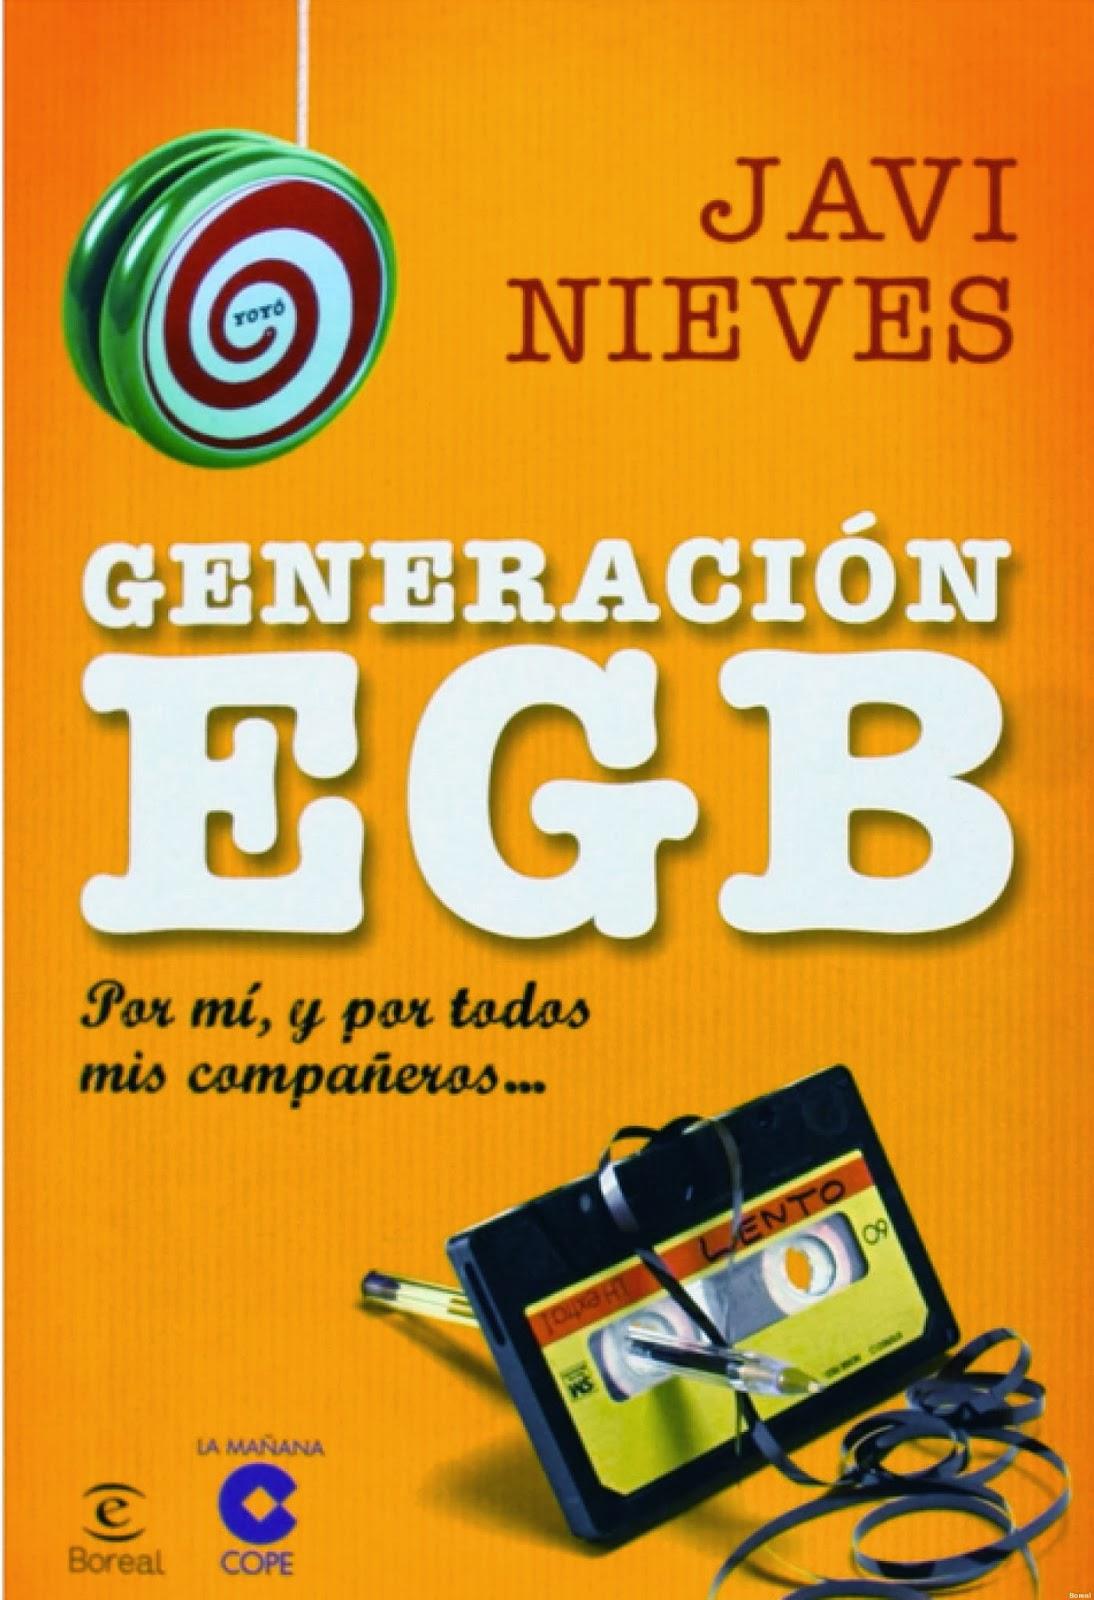 http://estantesllenos.blogspot.com/2014/02/generacion-egb-javi-nieves.html